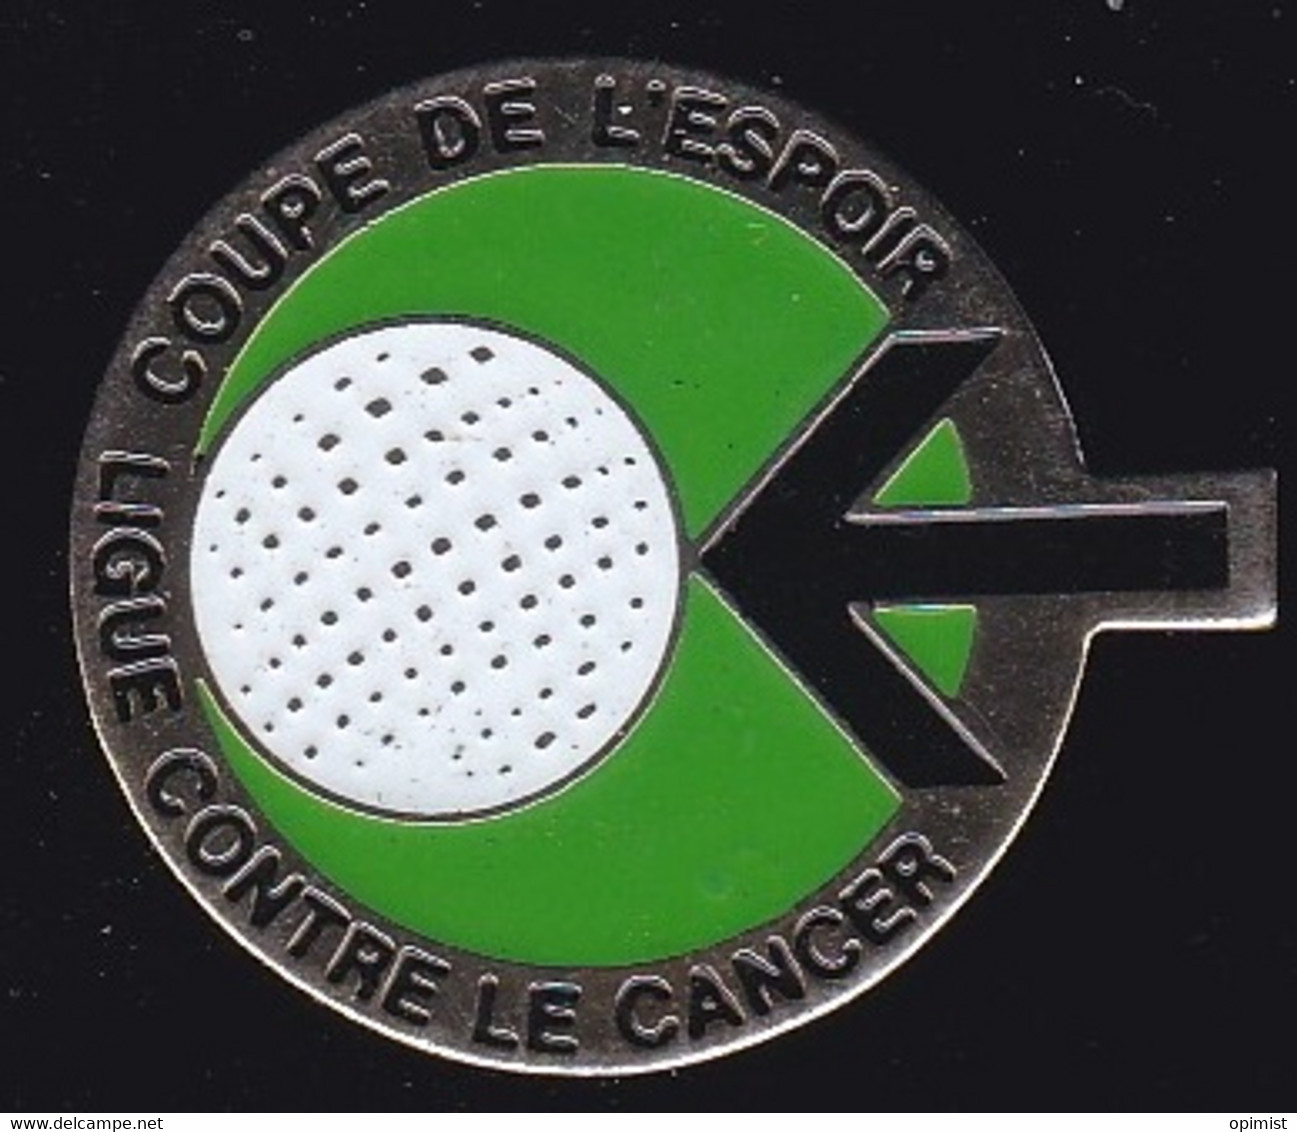 71224- Pin's.Ligue Cotre Le Cancer.Golf. - Golf